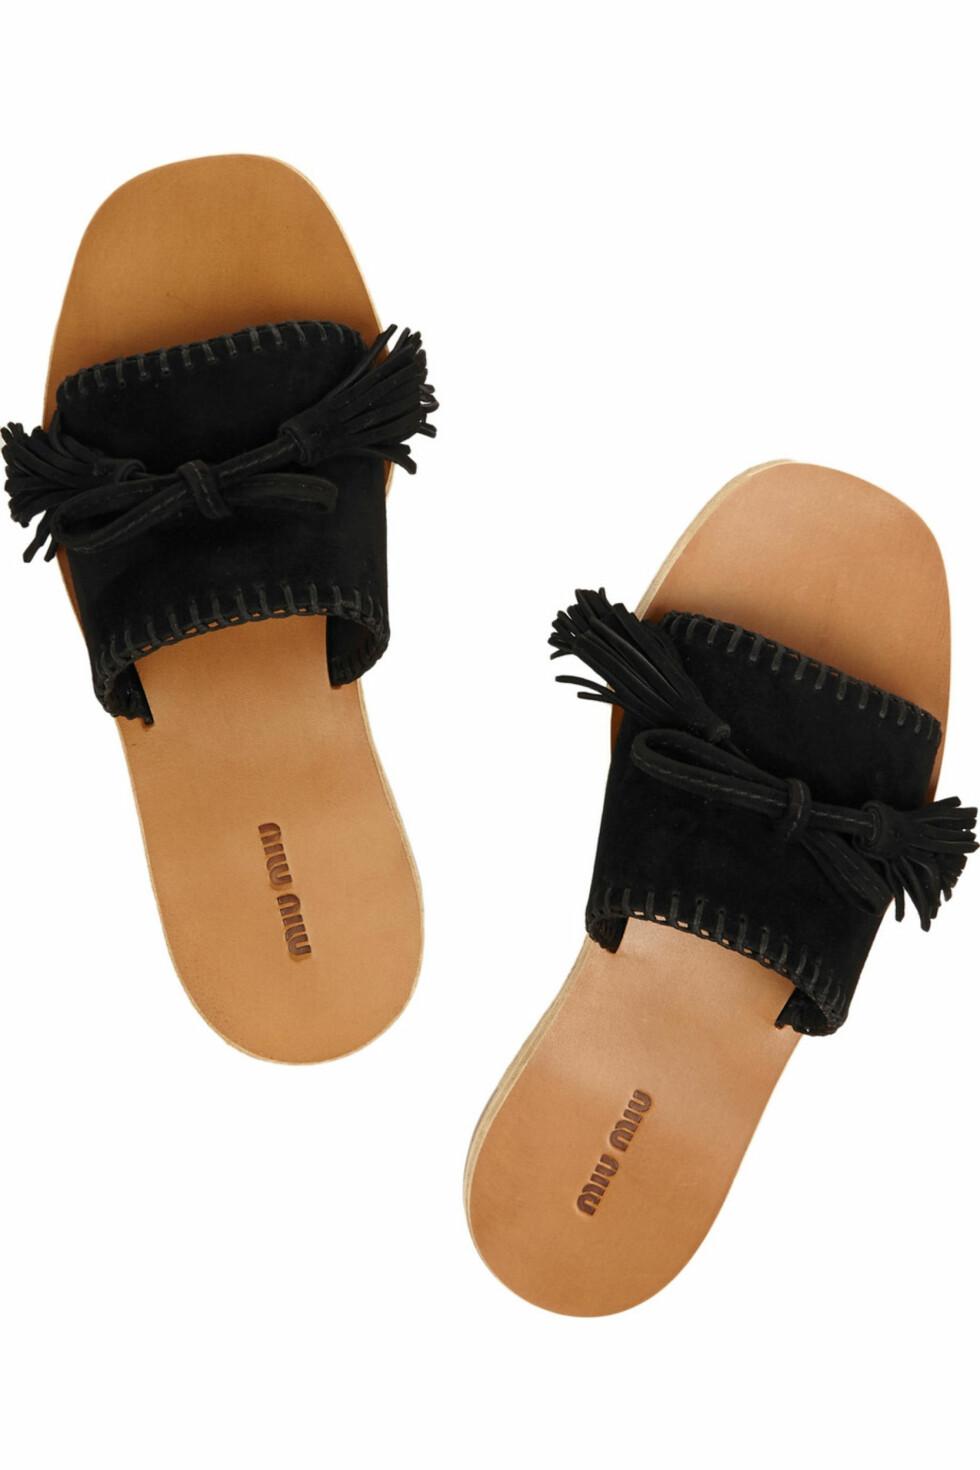 Sandaler fra Miu Miu, ca. kr 2700.  Foto: Net-a-porter.com